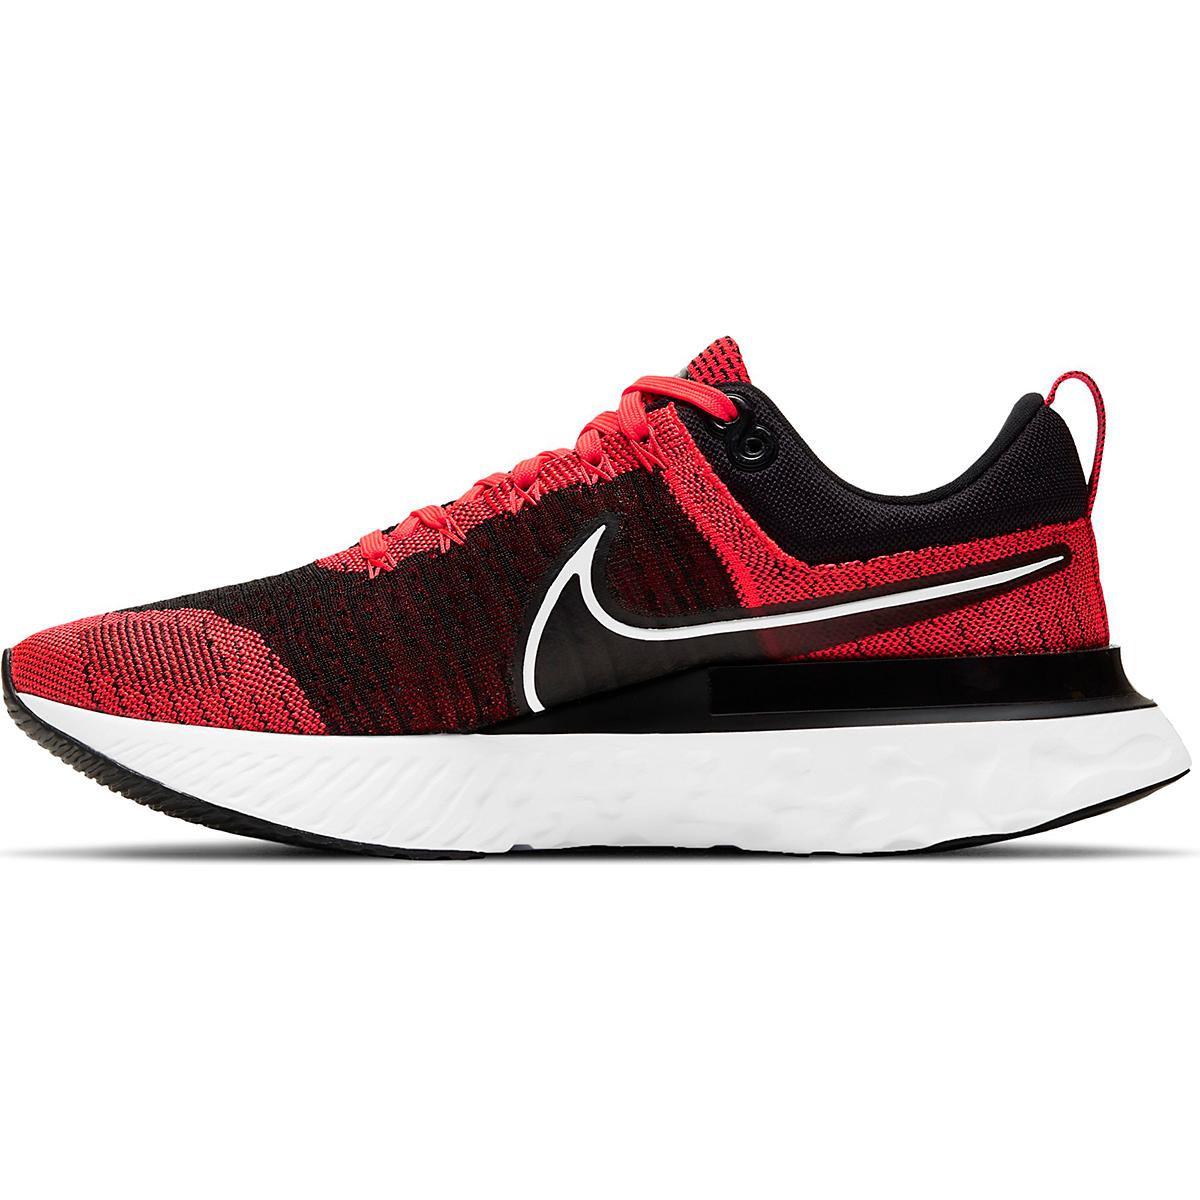 Men's Nike React Infinity Run Flyknit 2 Running Shoe - Color: Bright Crimson/White/Black/Smike Grey - Size: 6 - Width: Regular, Bright Crimson/White/Black/Smike Grey, large, image 2